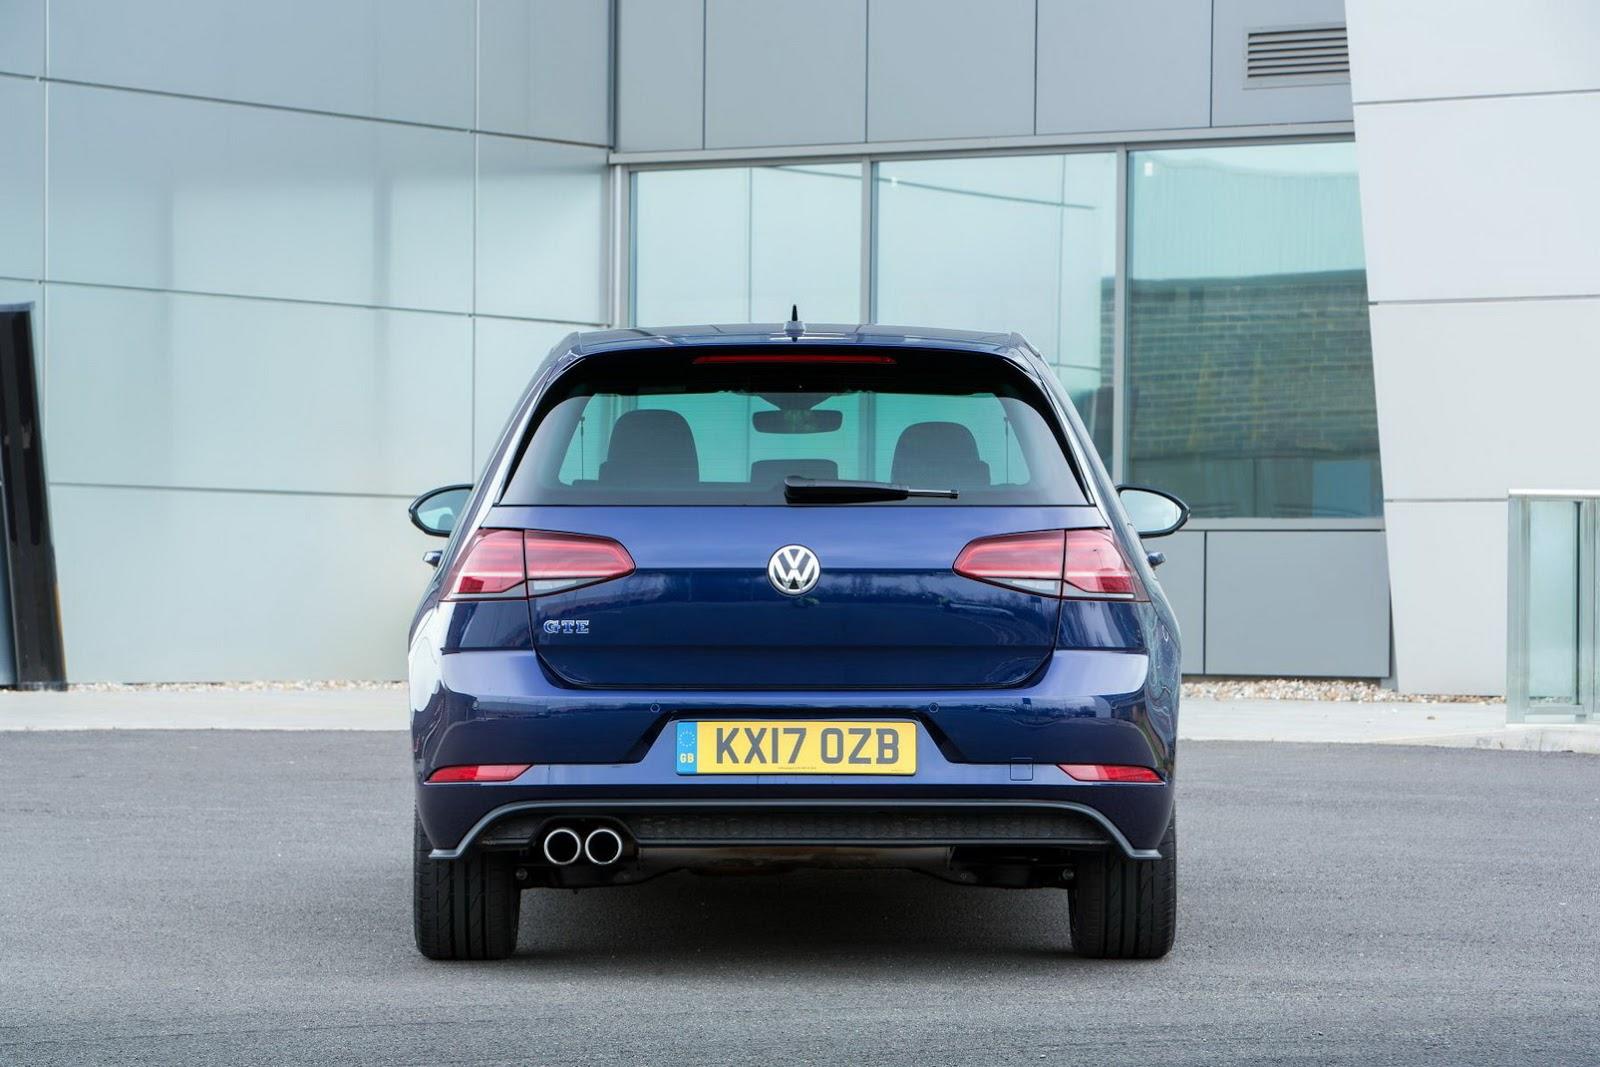 2017 Volkswagen Golf Gte Uk Pricing